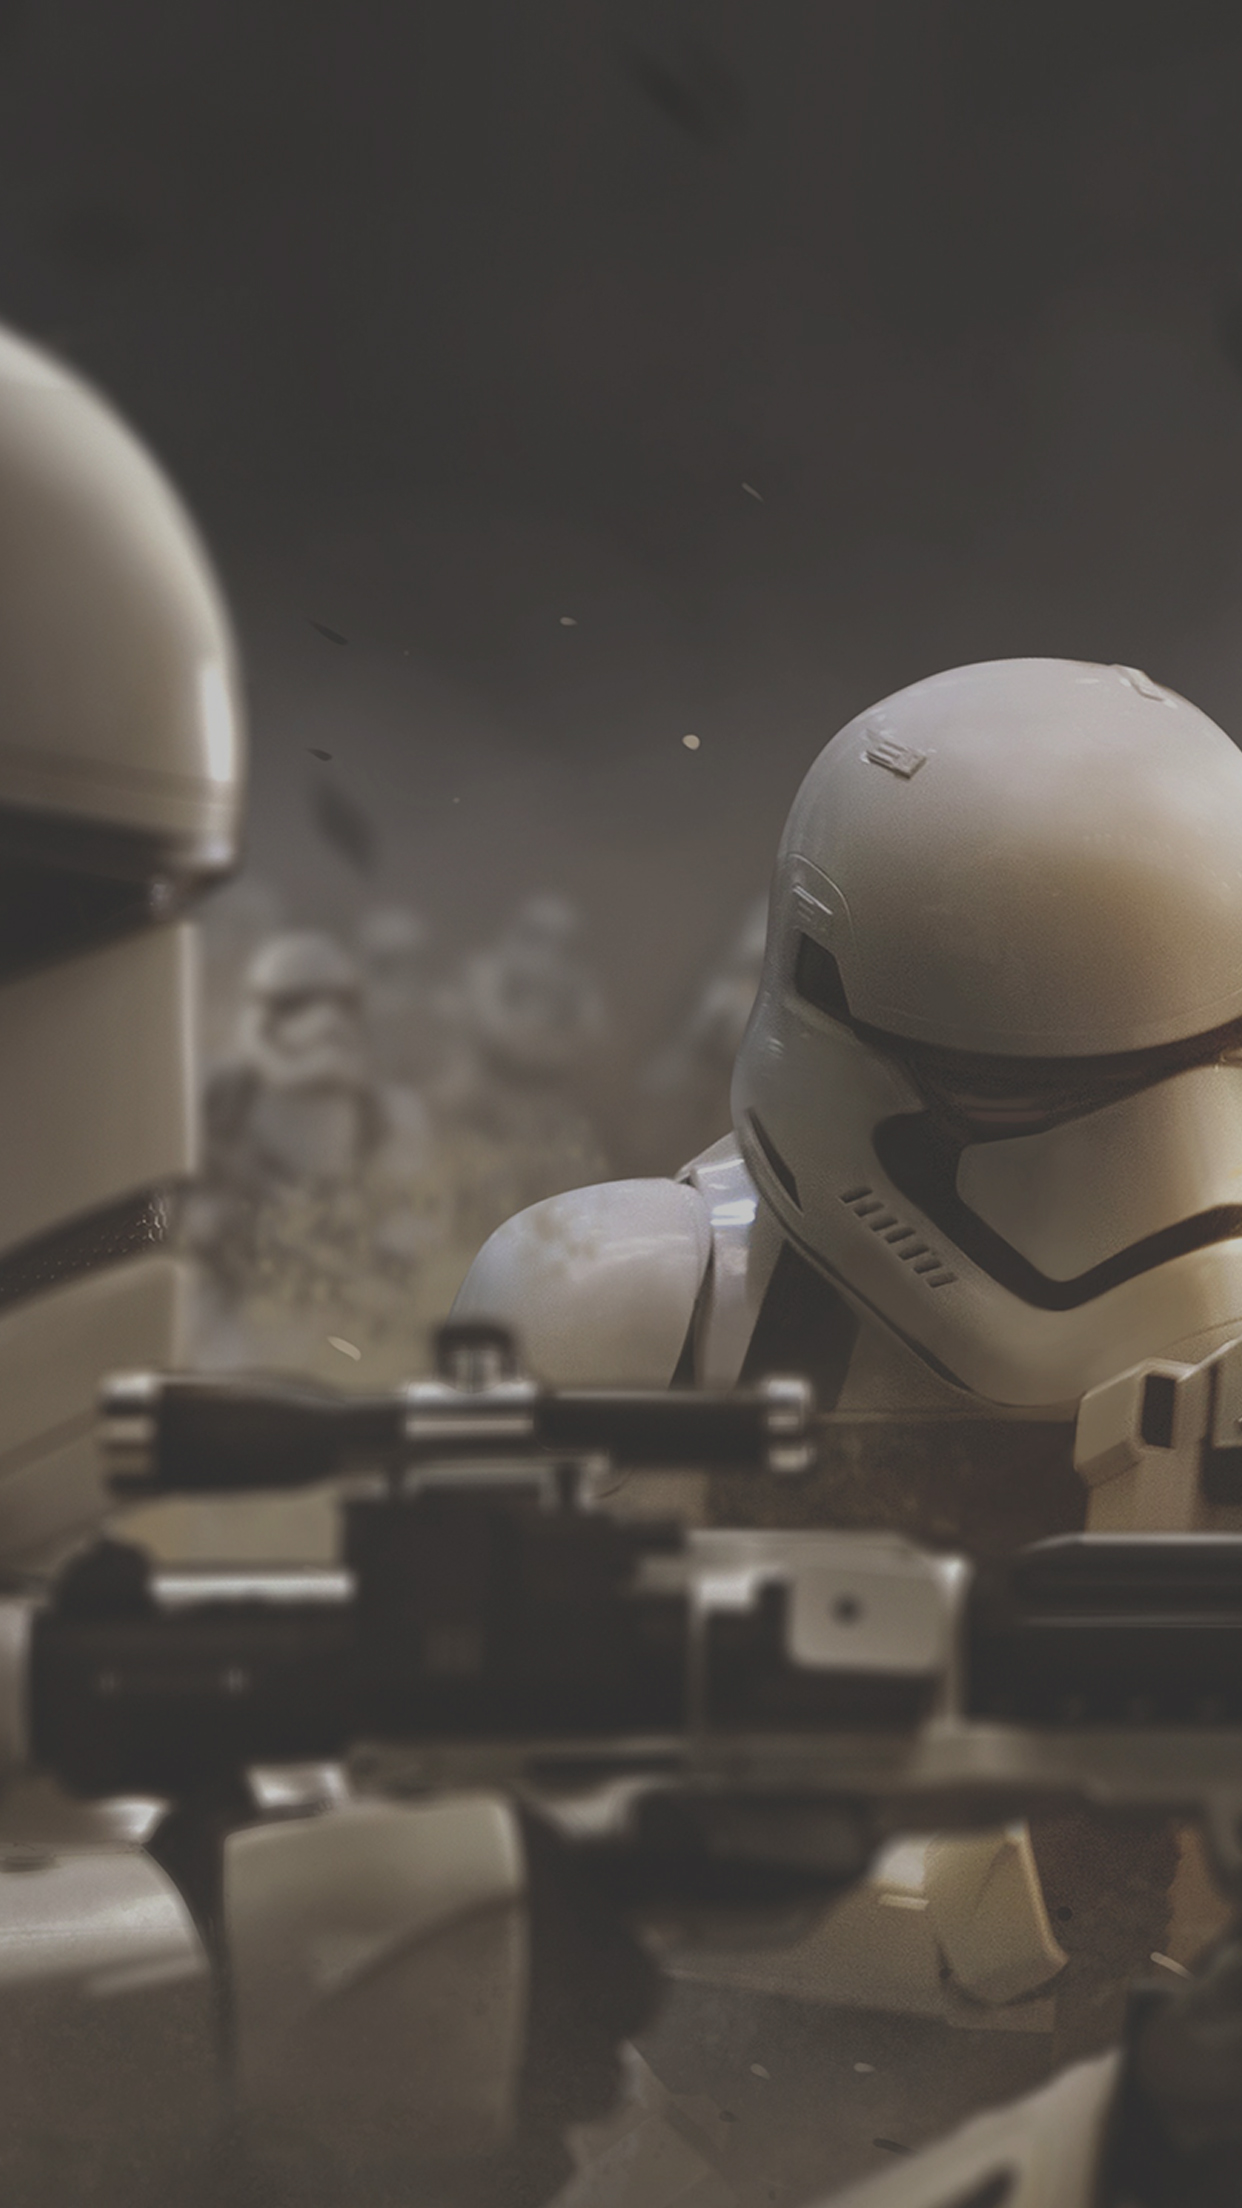 force-awakens-wallpaper (29)